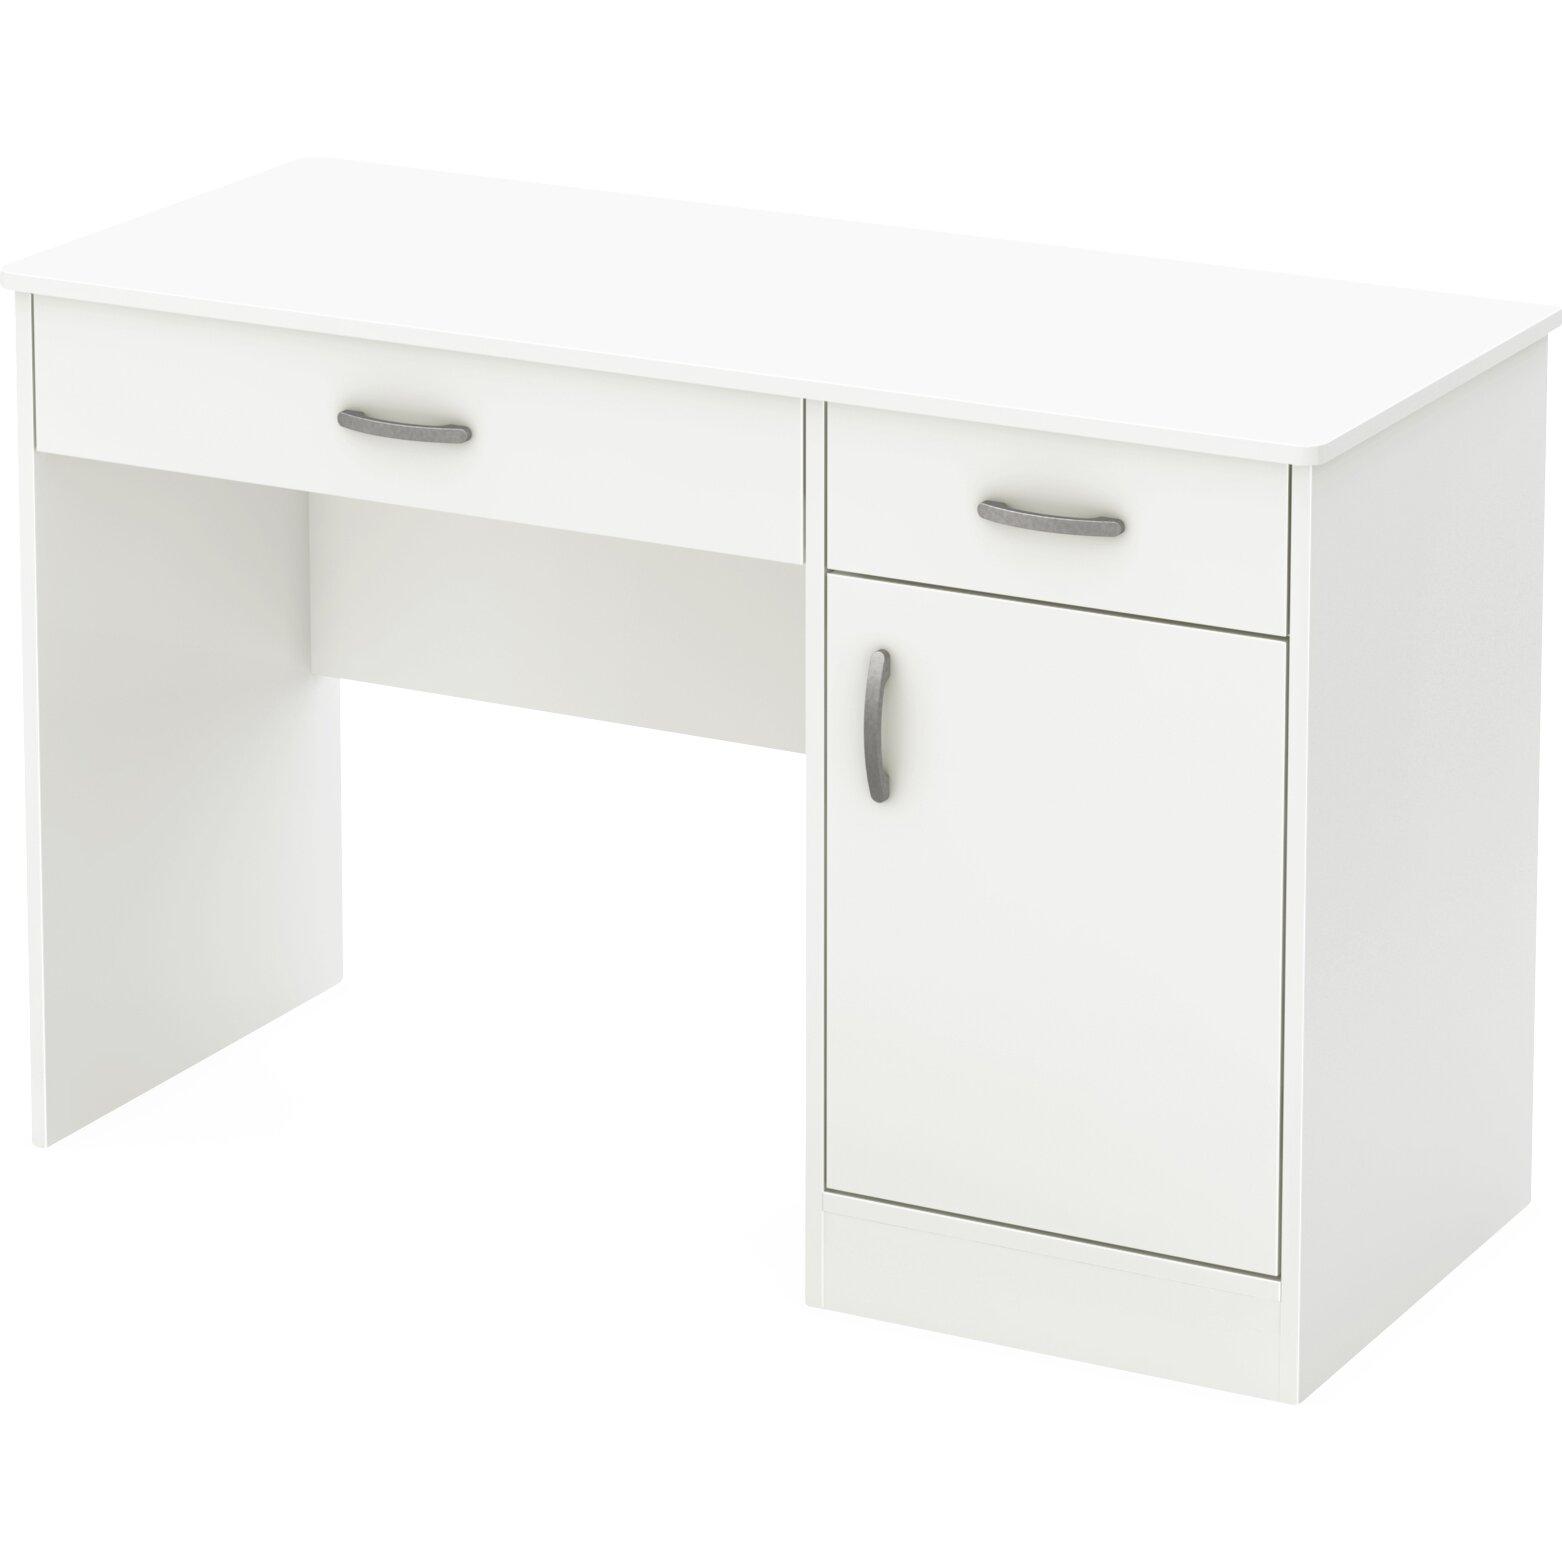 South shore axess computer desk reviews wayfair - Bureau de travail blanc ...